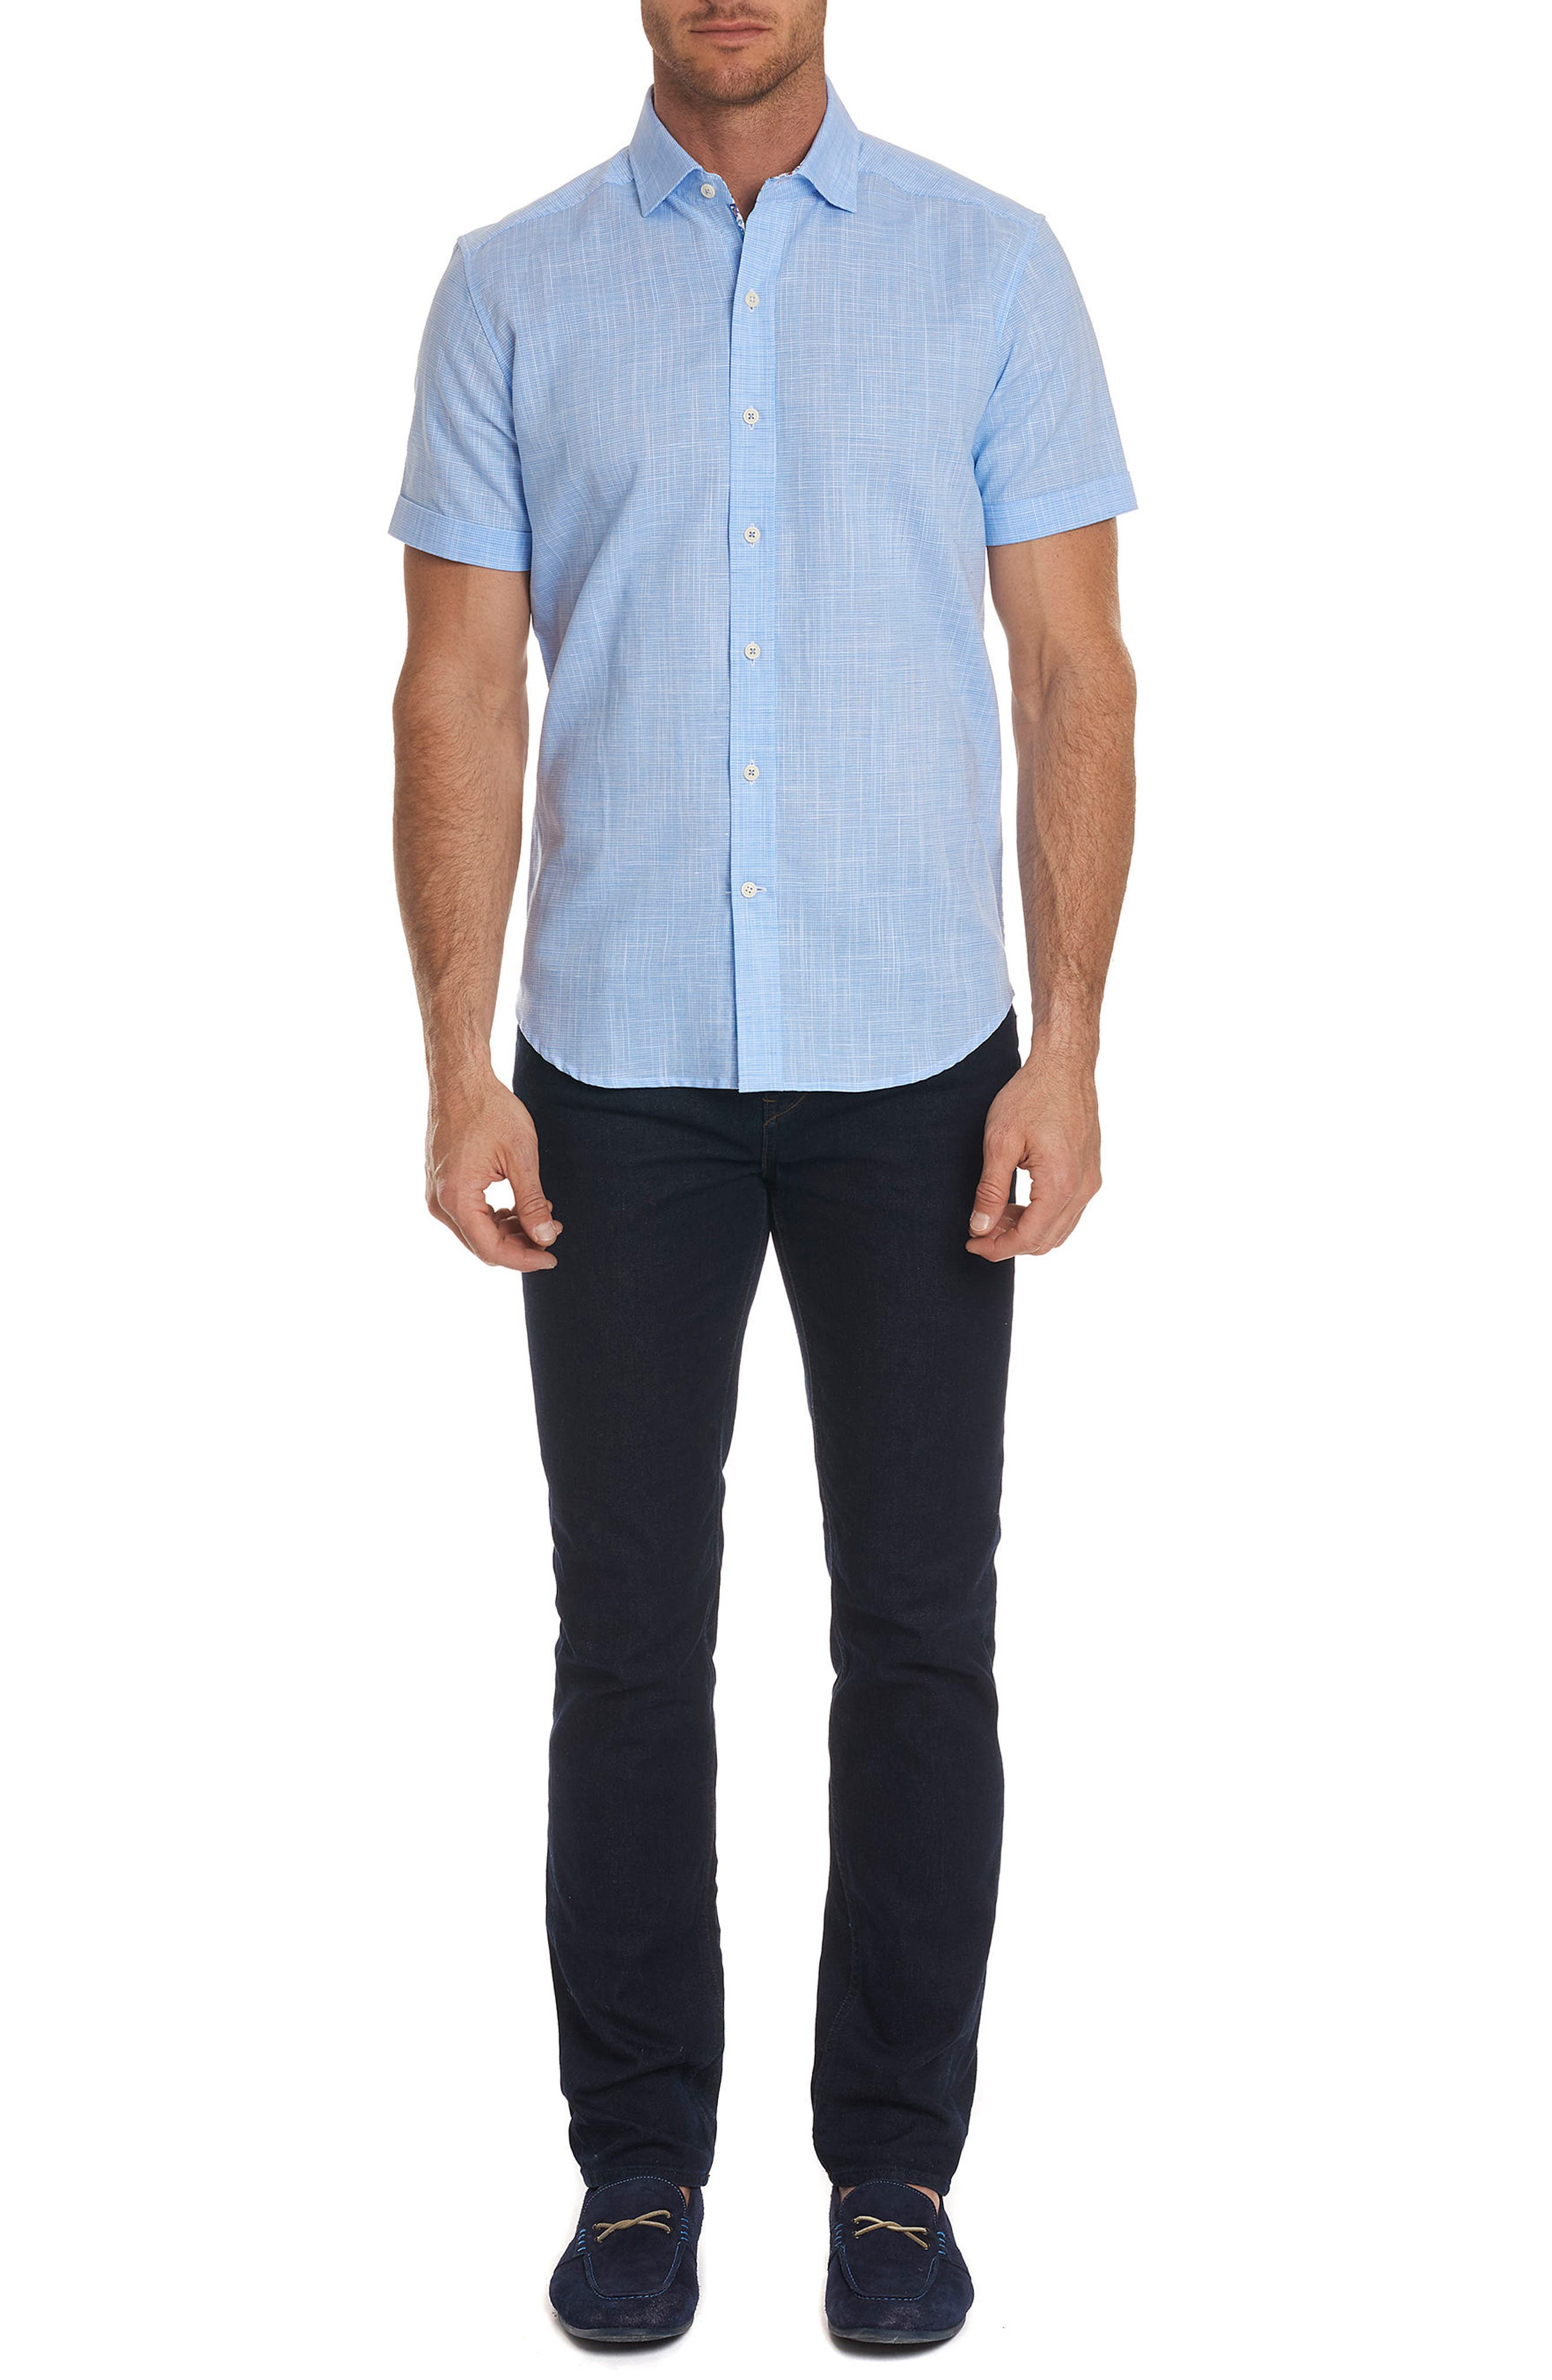 ROBERT GRAHAM,                             Isia Tailored Fit Sport Shirt,                             Alternate thumbnail 9, color,                             400